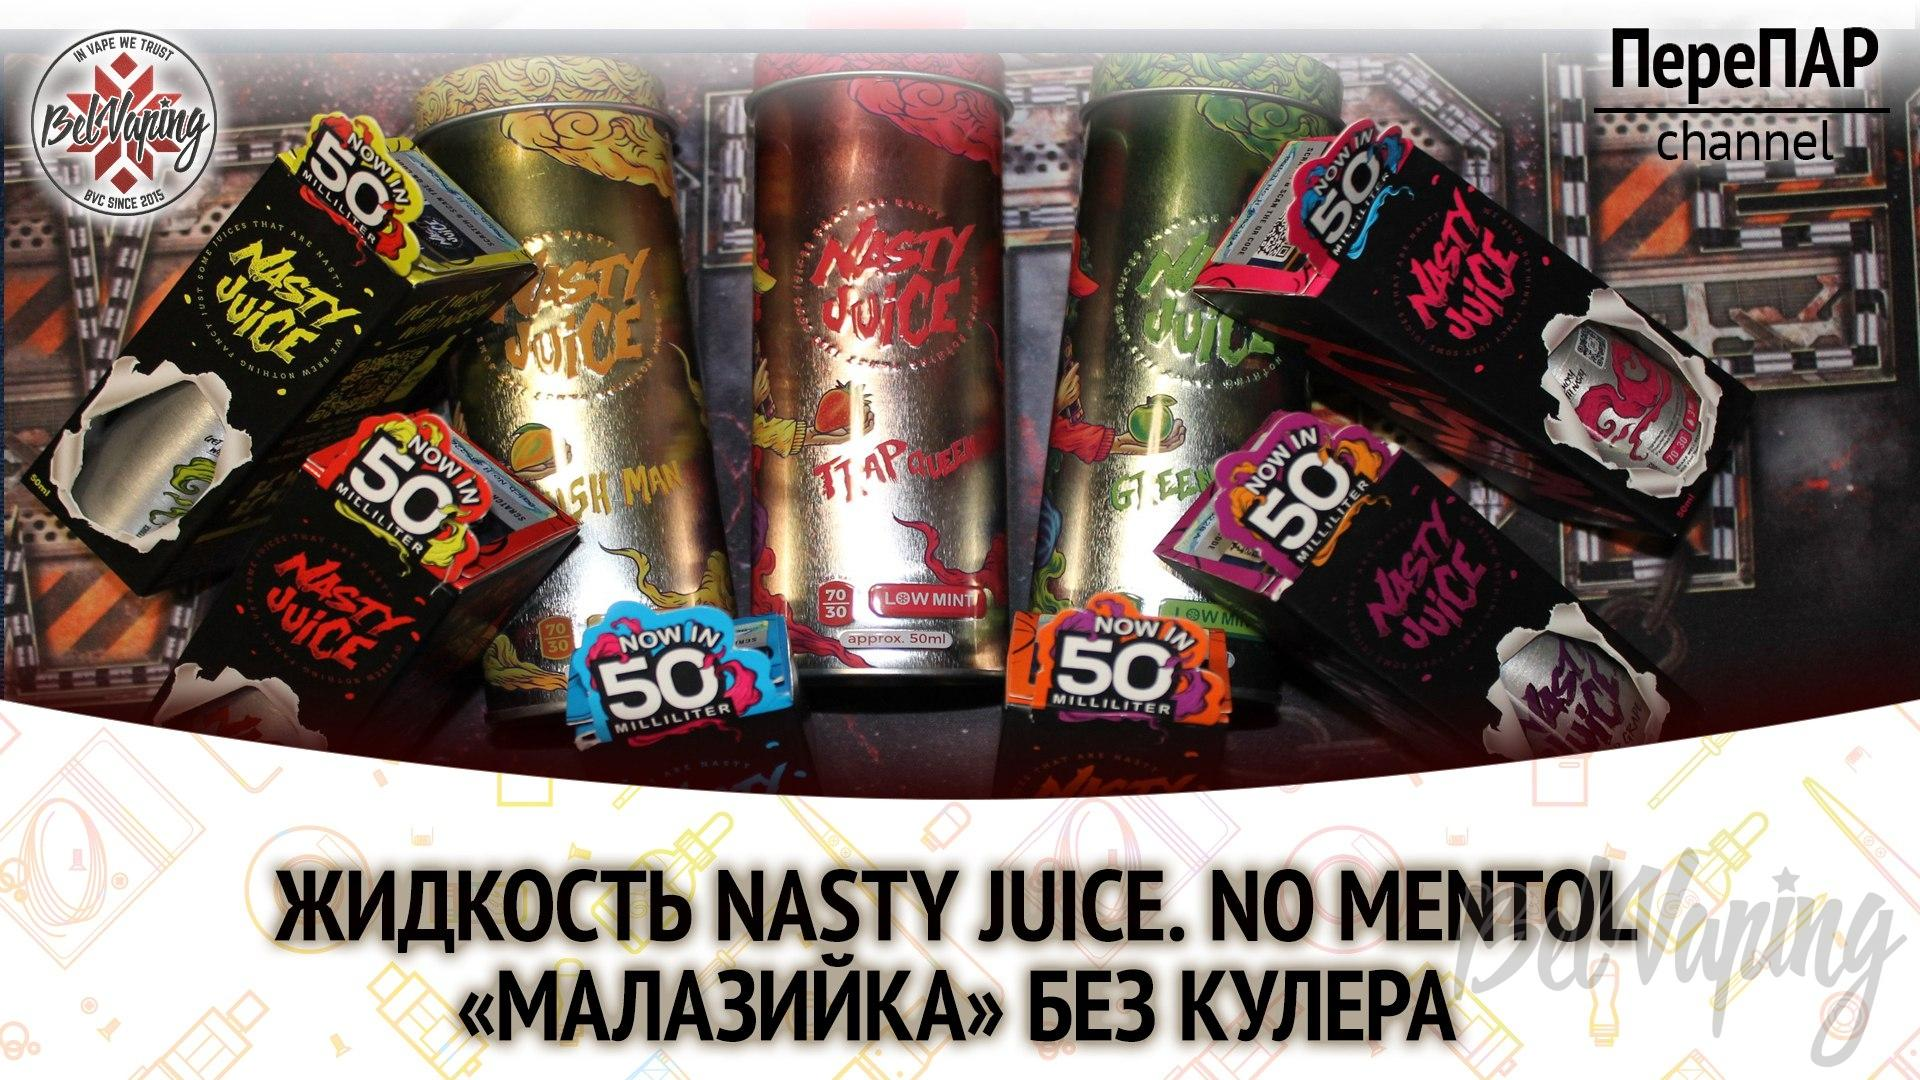 Обзор жидкости Nasty Juice без ментола серий Double Fruity Lemonade и Fruity Low Mint